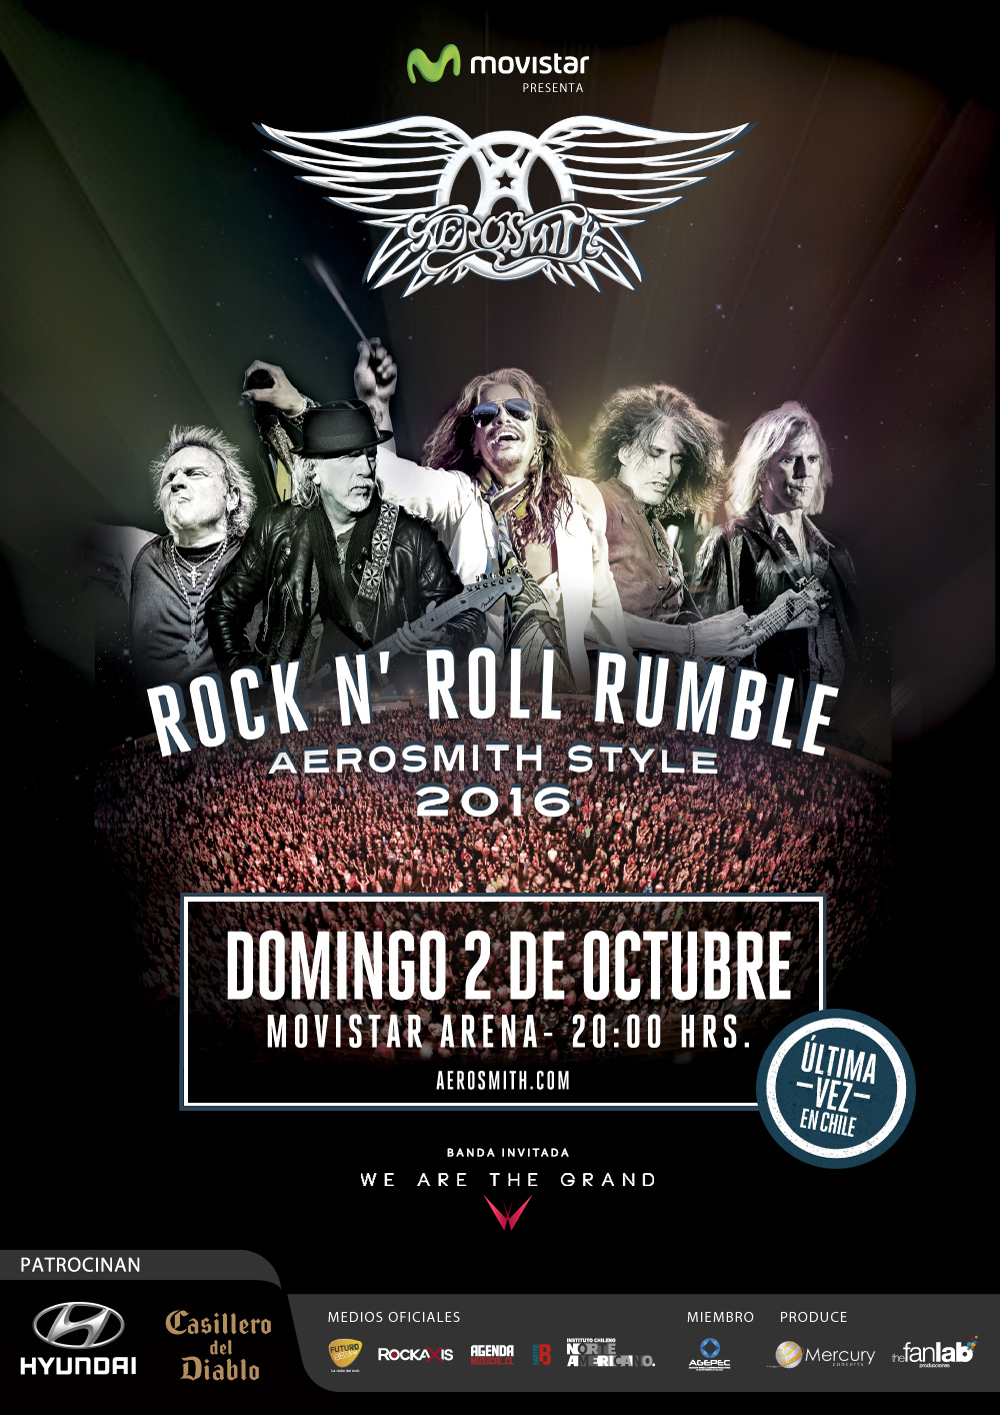 Por ultima vez en Chile se presenta Aerosmith